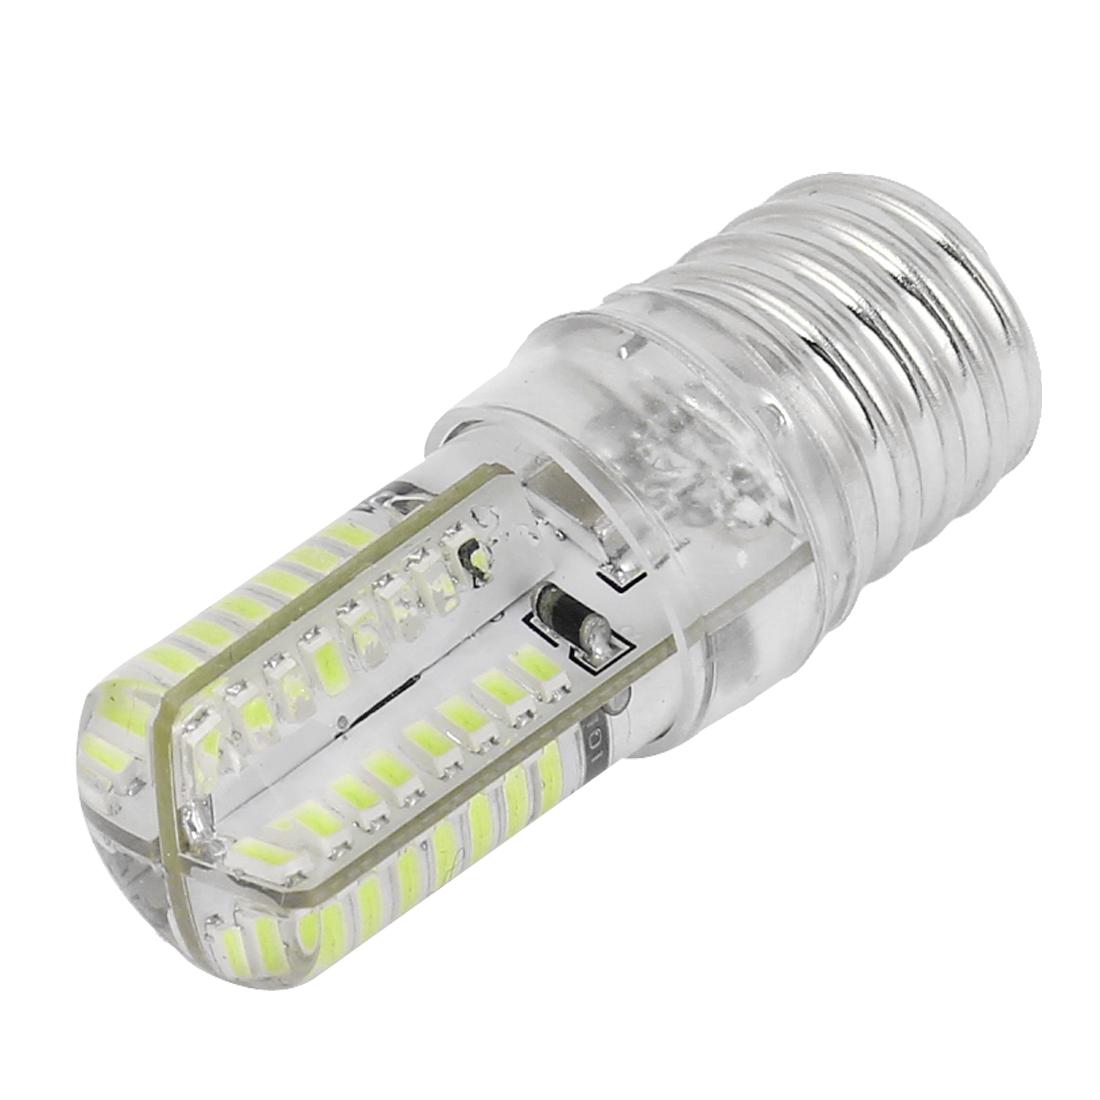 E17 Socket 5W 64 LED Table Lamp Bulb 3014 SMD Light Pure White AC 200V-240V